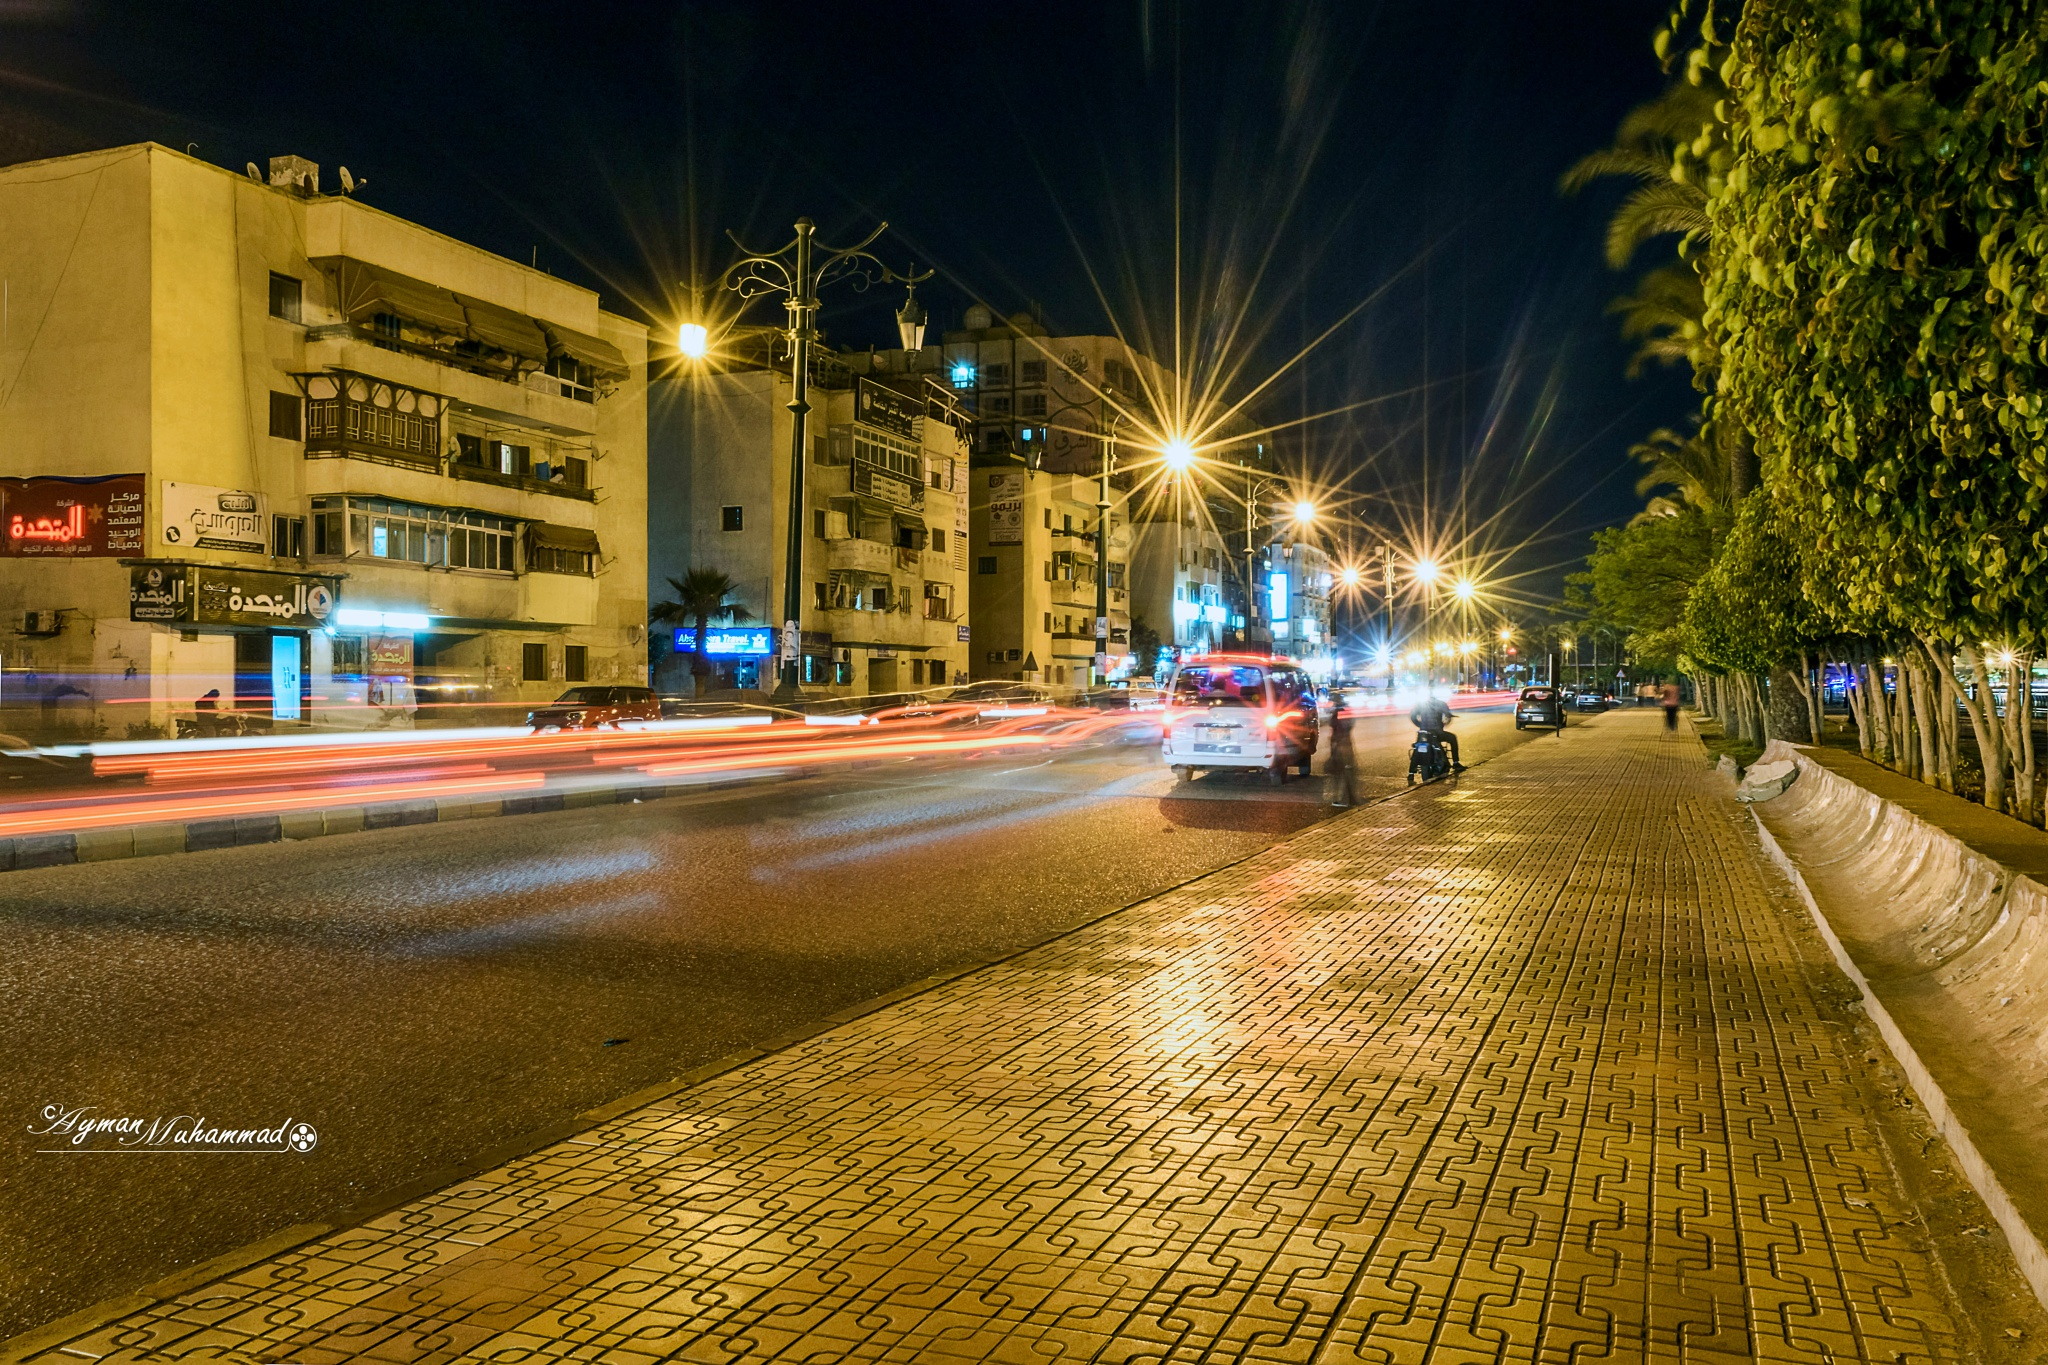 Streets of Damietta city at night  by AymanMuhammad